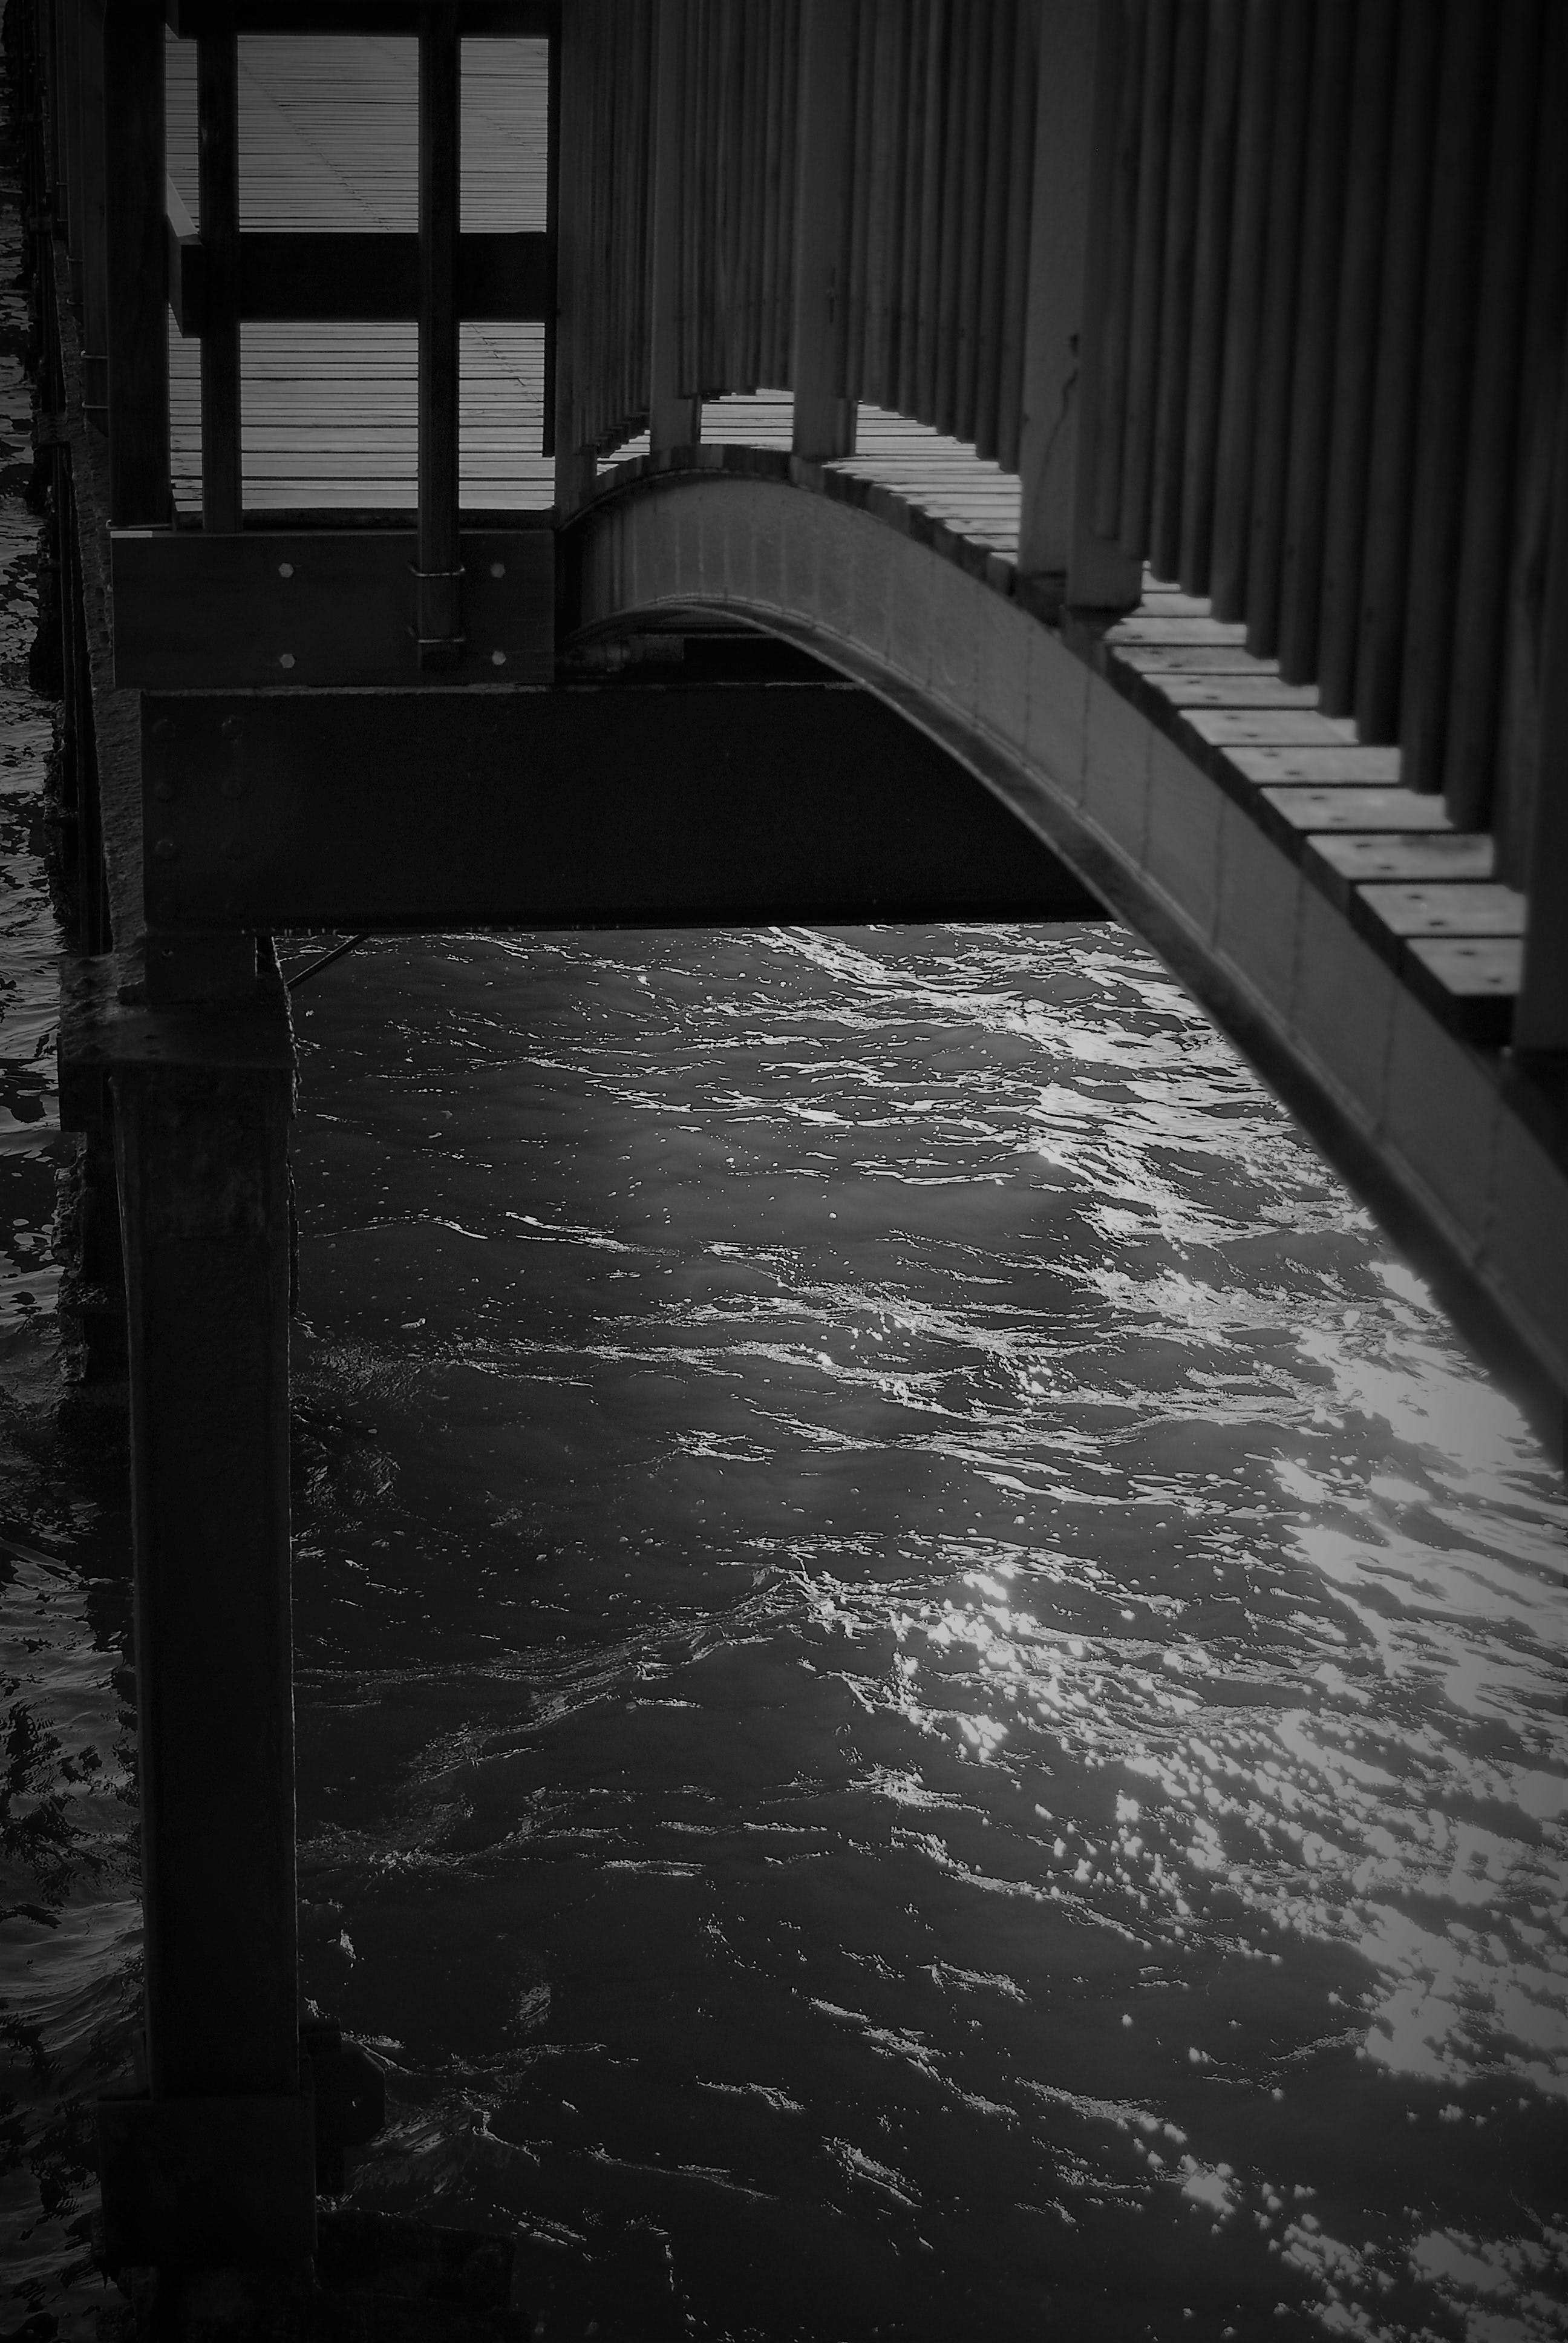 Free stock photo of Black and White Bridge Art Architecture Mood Sea